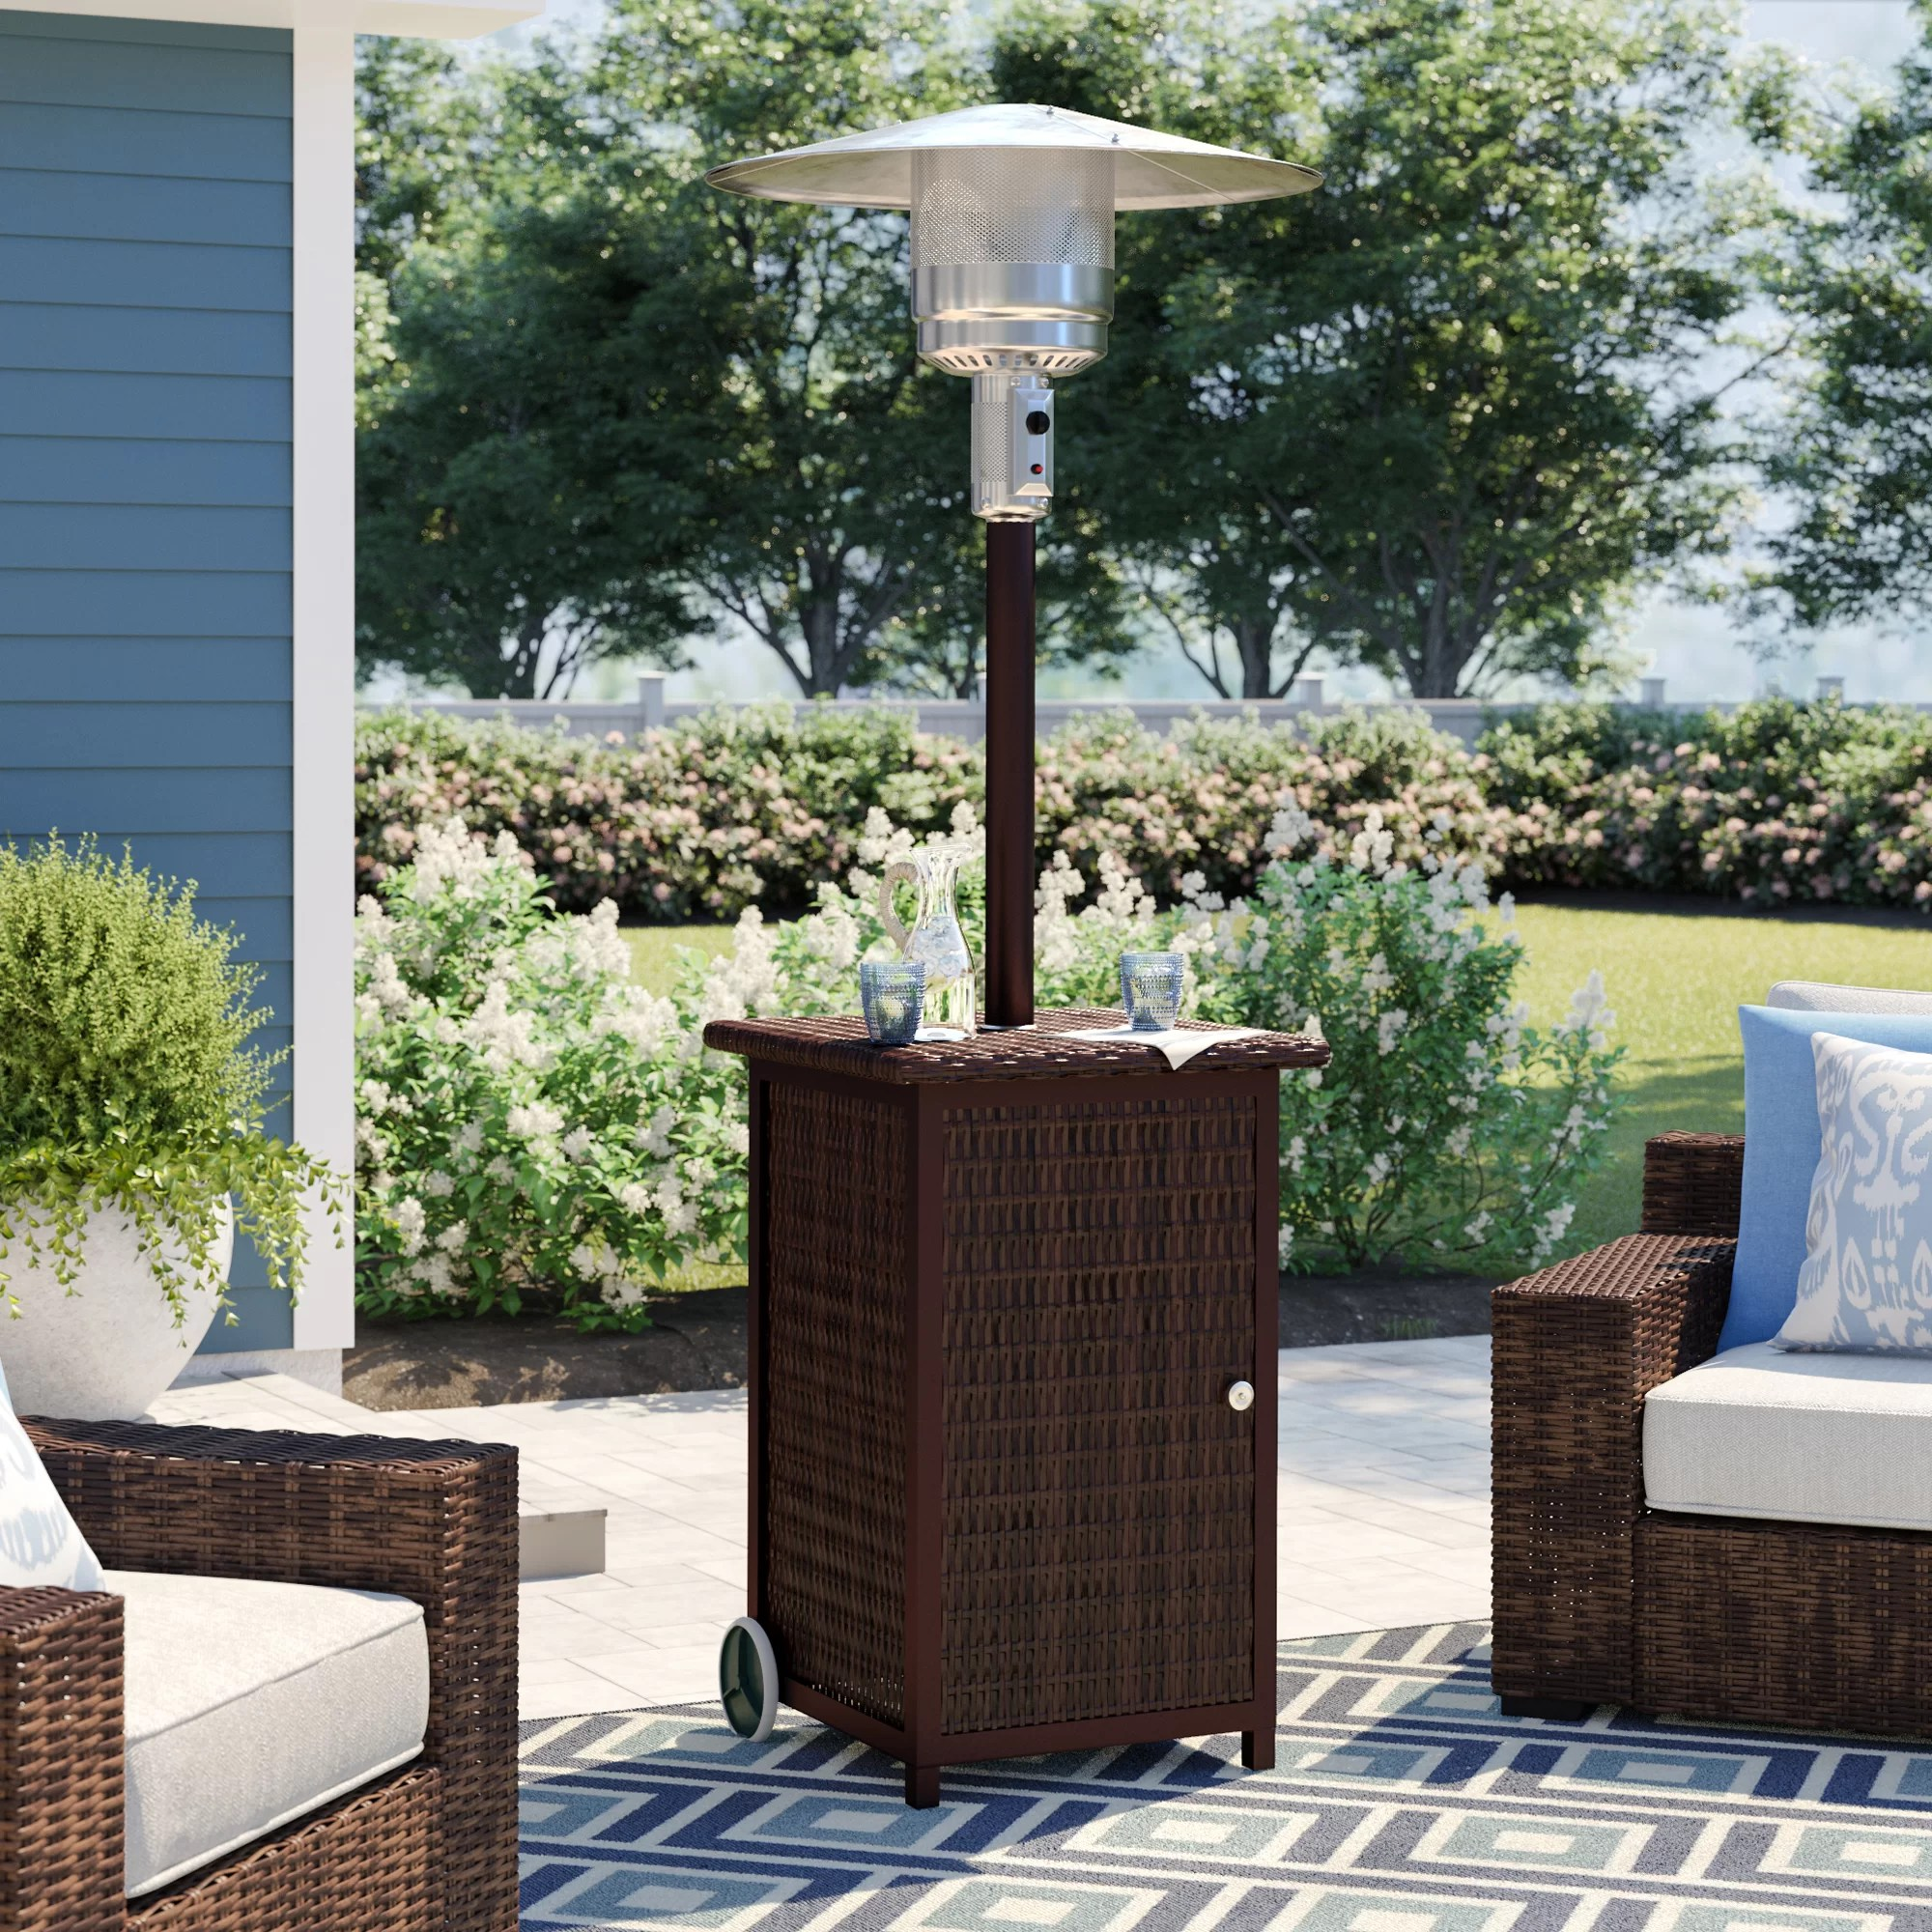 az patio tall stainless steel propane